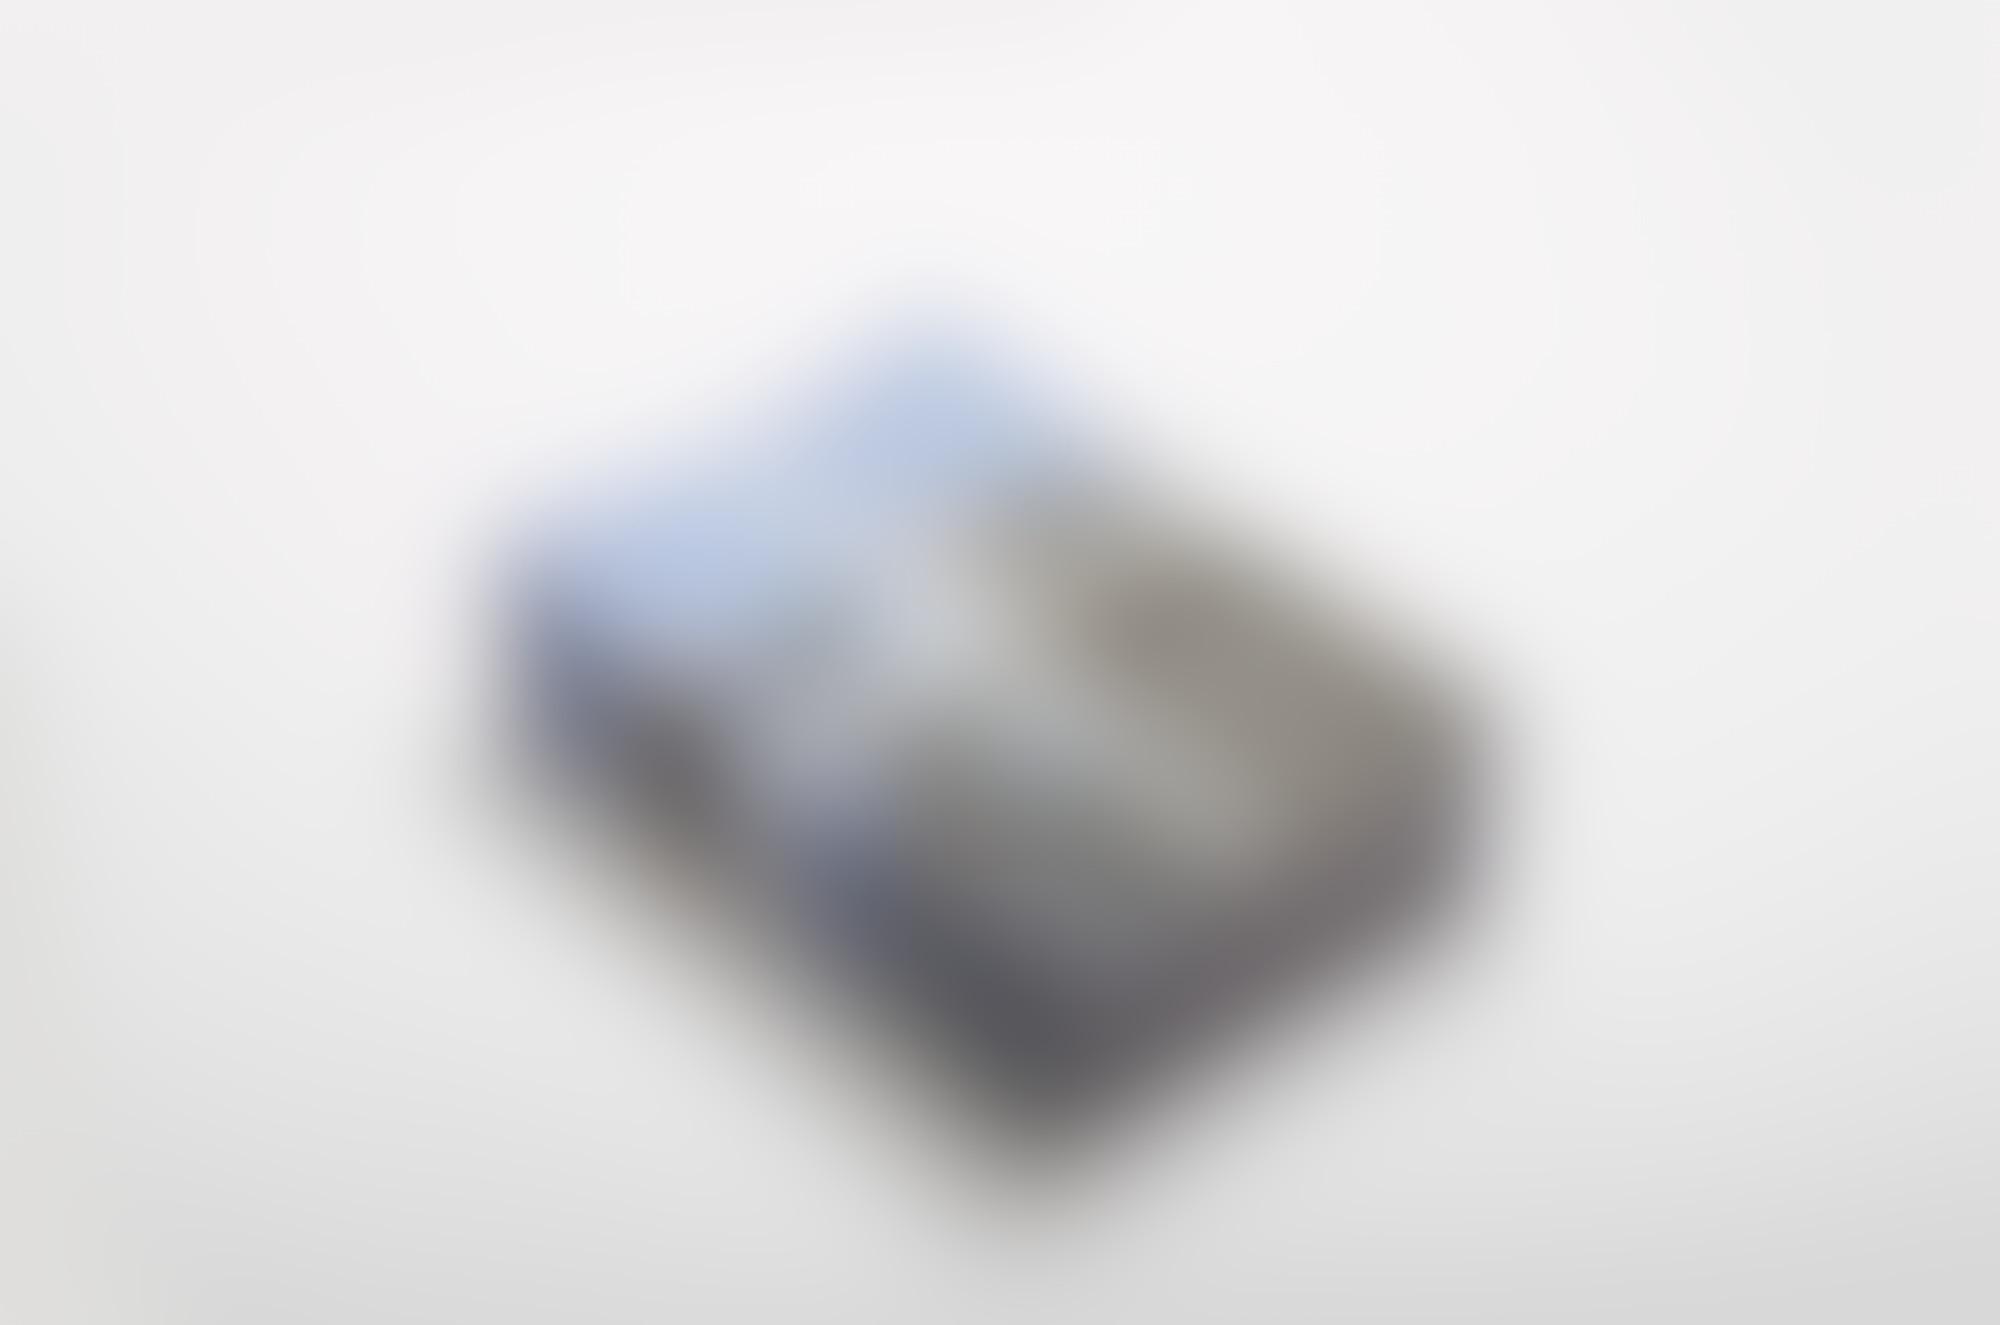 Tvc transmission 01 autocompressfitresizeixlibphp 1 1 0max h2000max w3 D2000q80s3ace7d45c9dafde27f25740671bac691